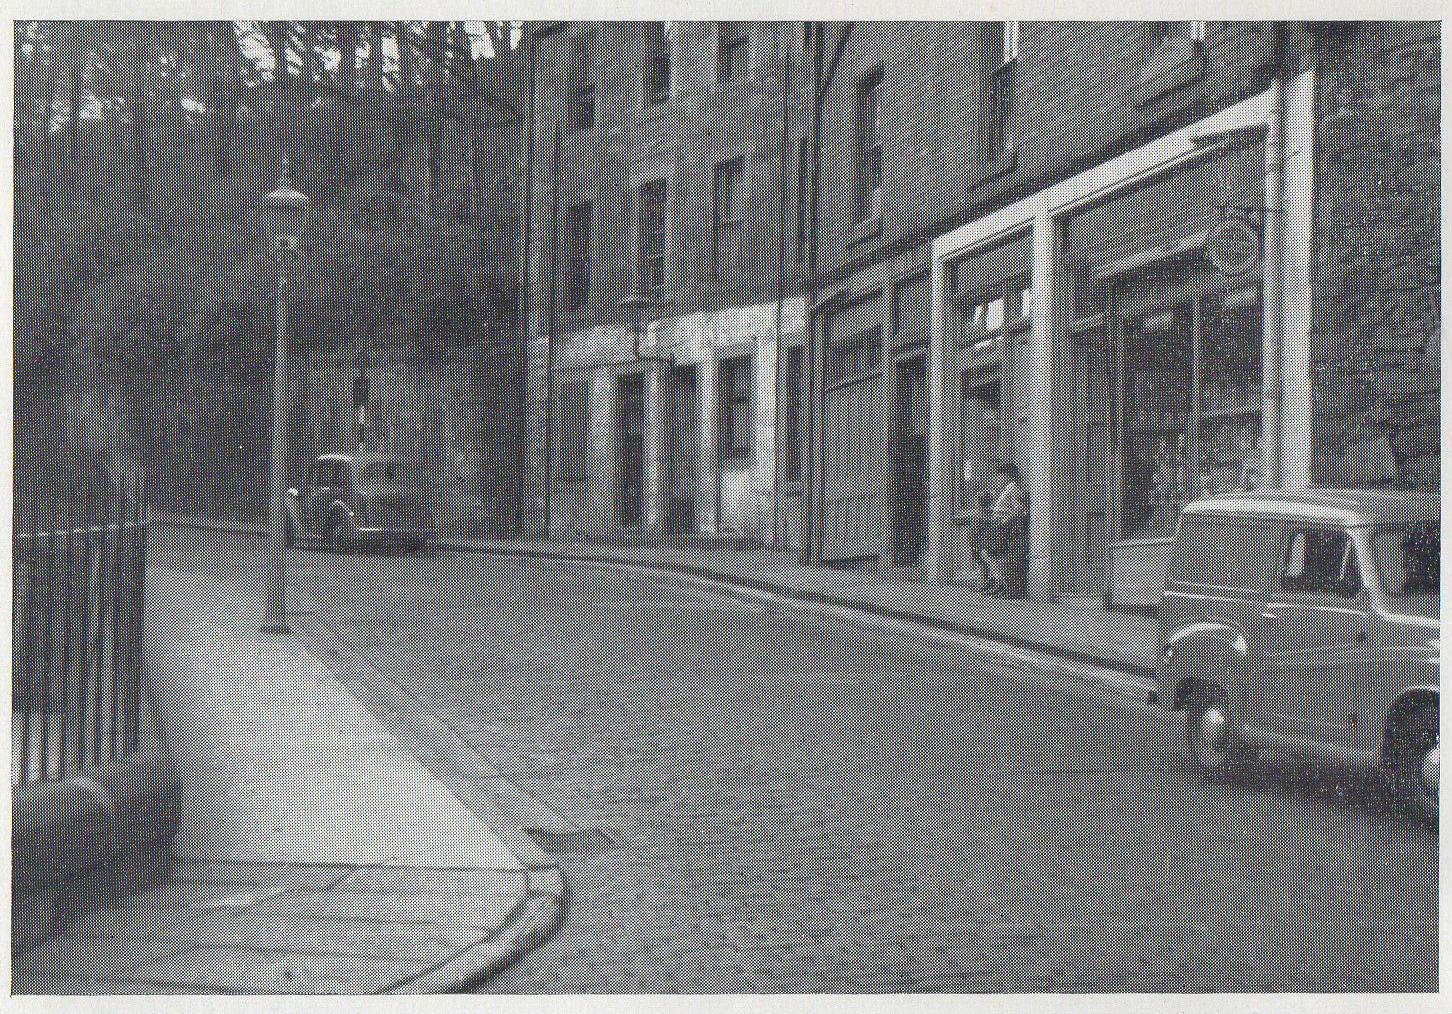 Kathleen Glancy - George Burn's Shop